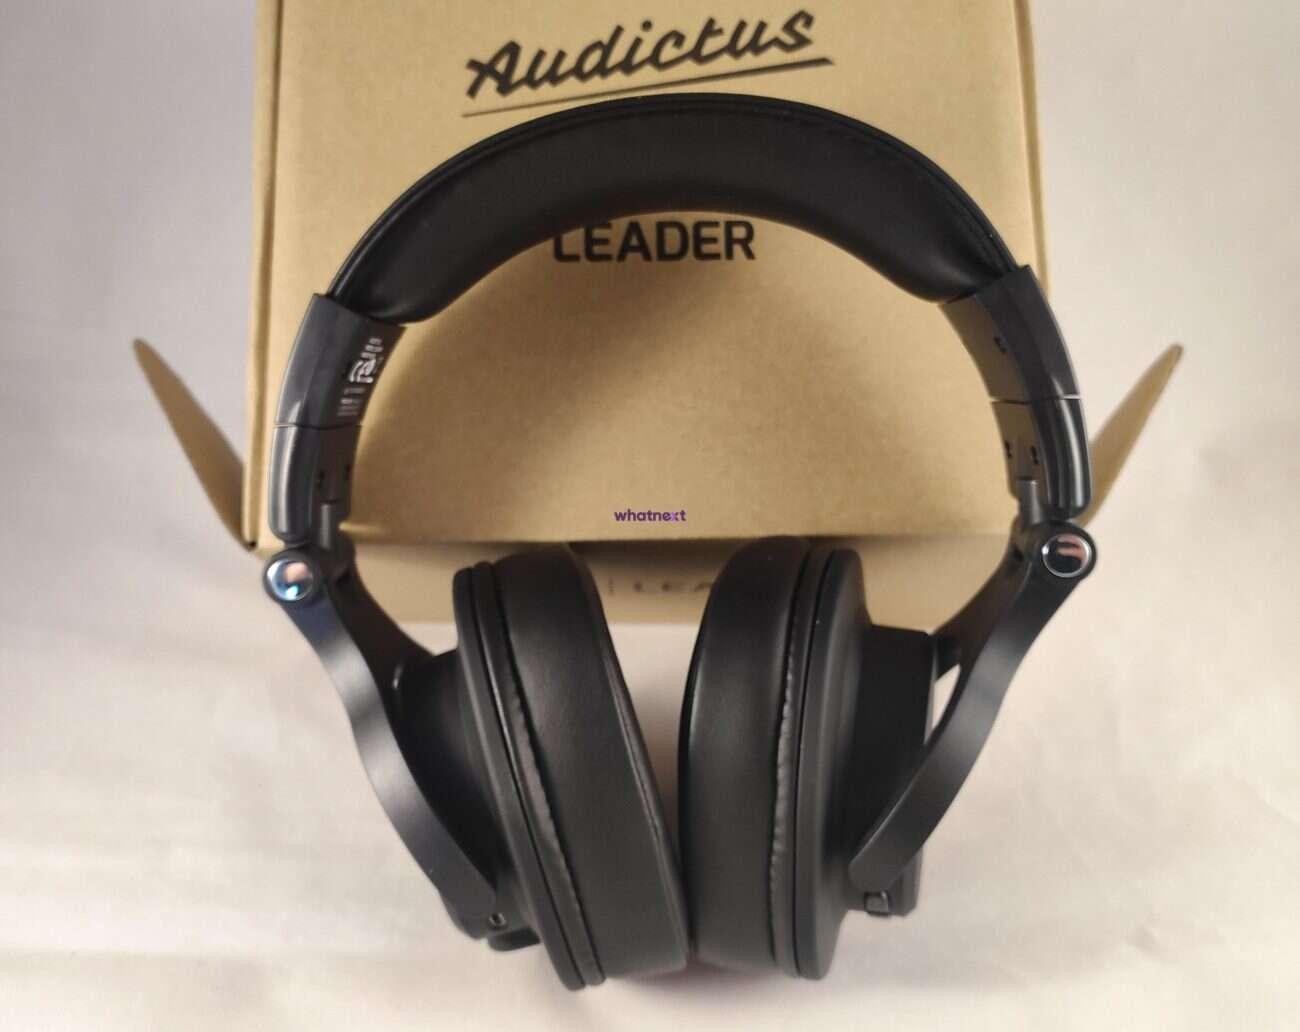 Test słuchawek Audictus Leader